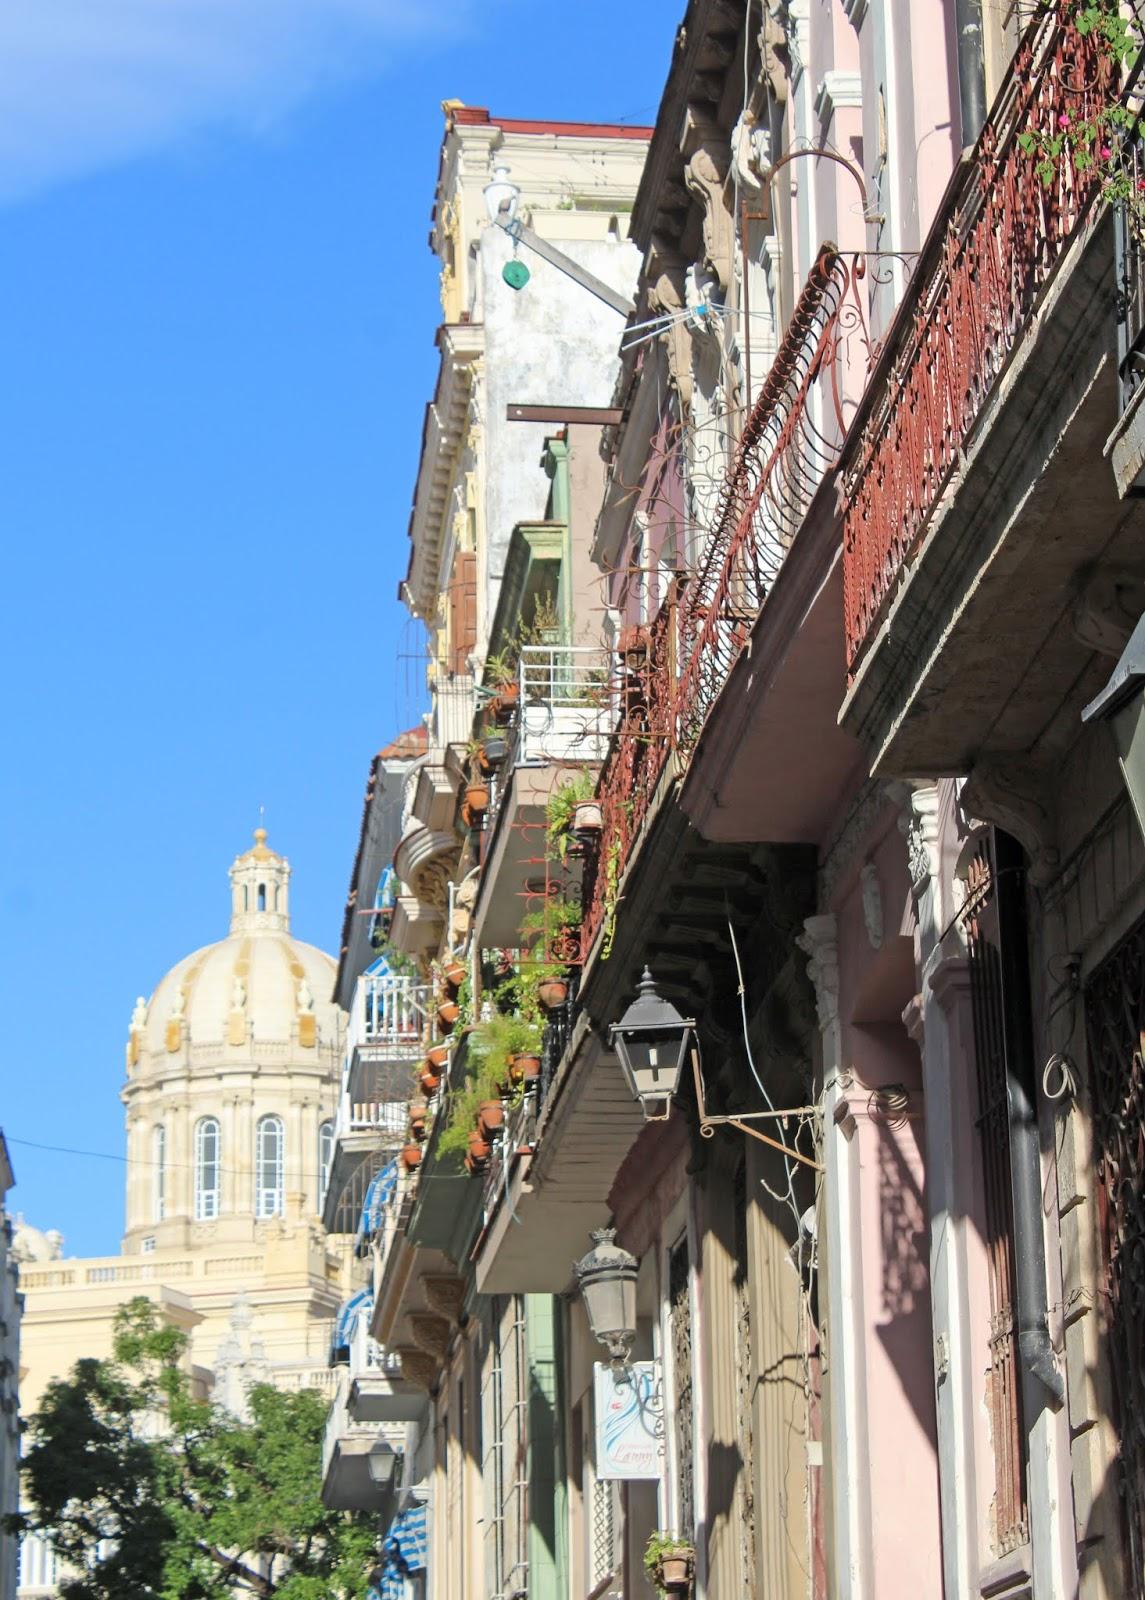 making restorations Havana day 3.5